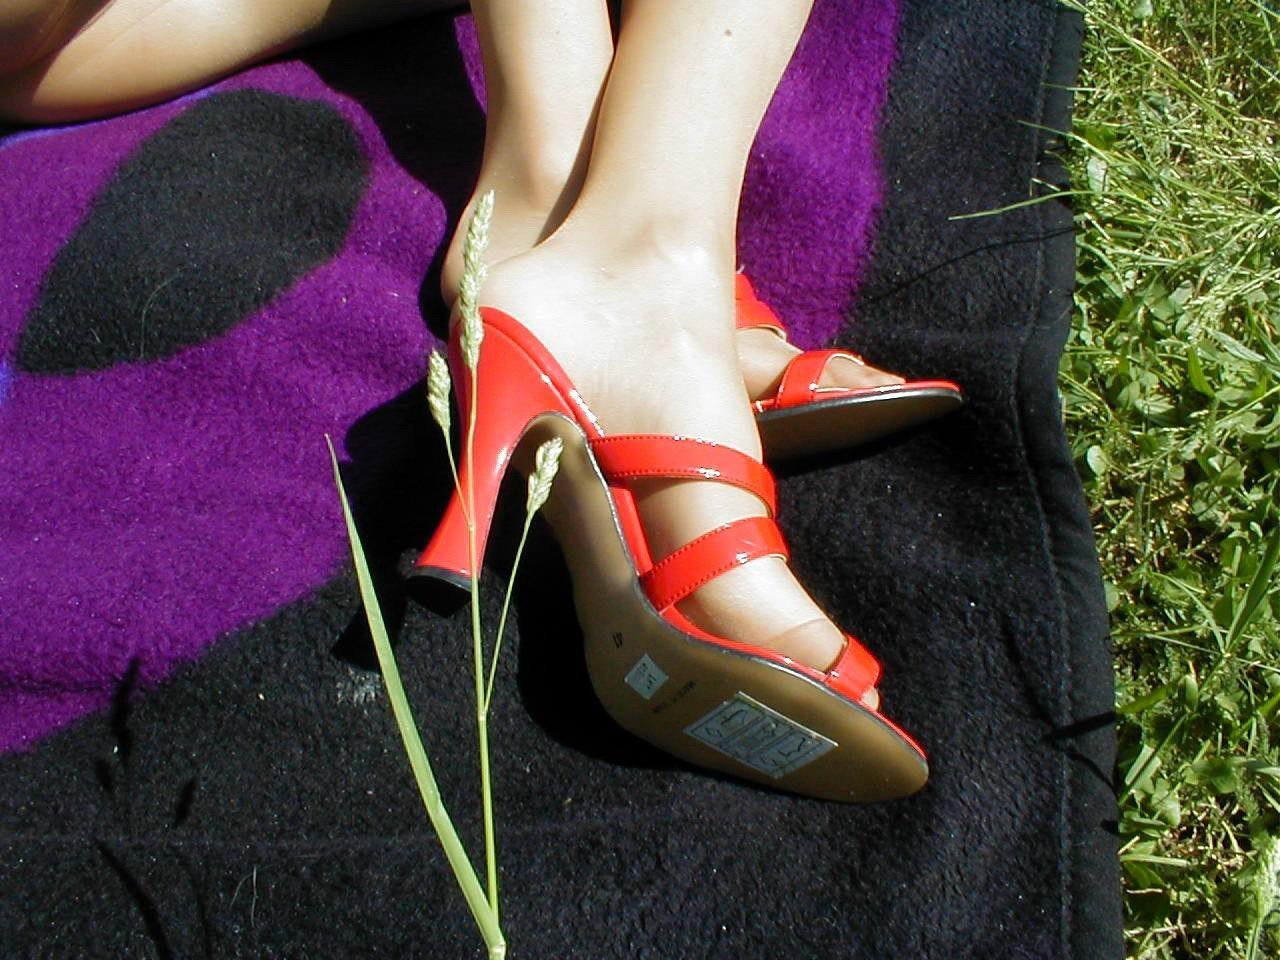 http://pbs-2.adult-empire.com/85/8570/019/pic/6.jpg